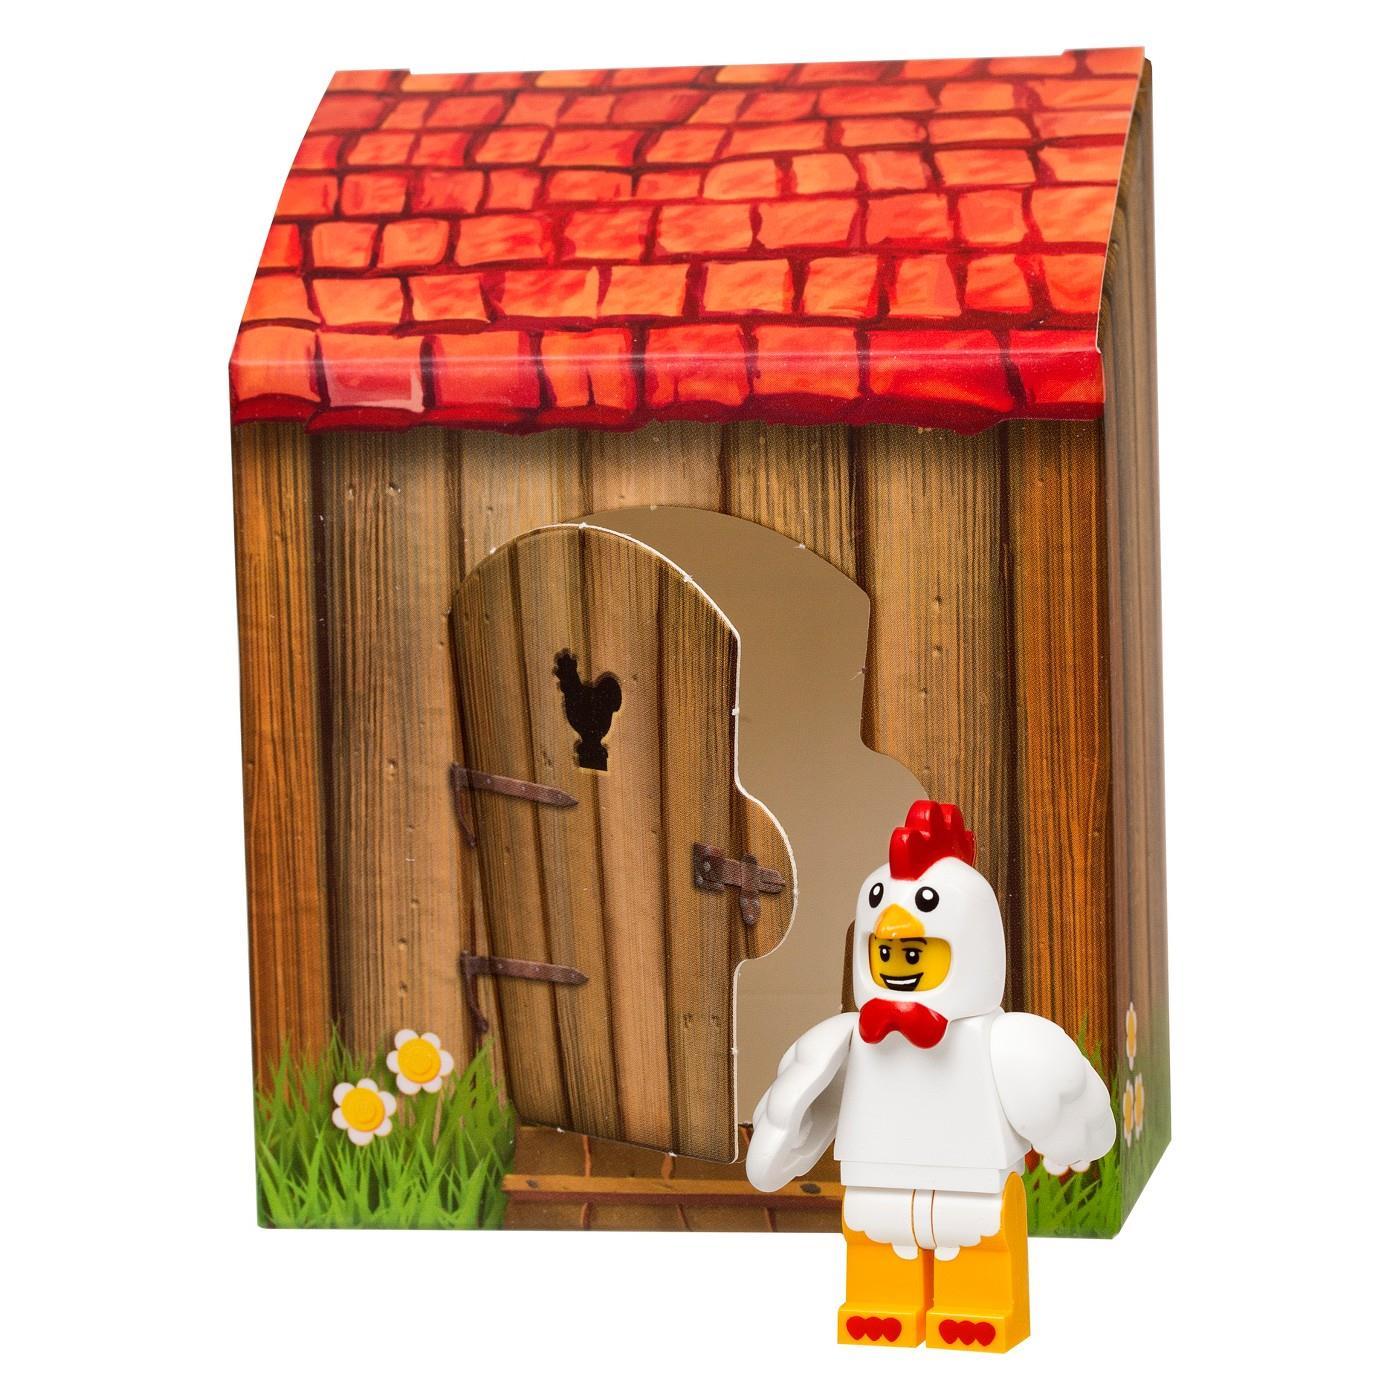 *NEW* 1 Lego Creator Easter BUNNY AND CHICK POLYBAG 40031